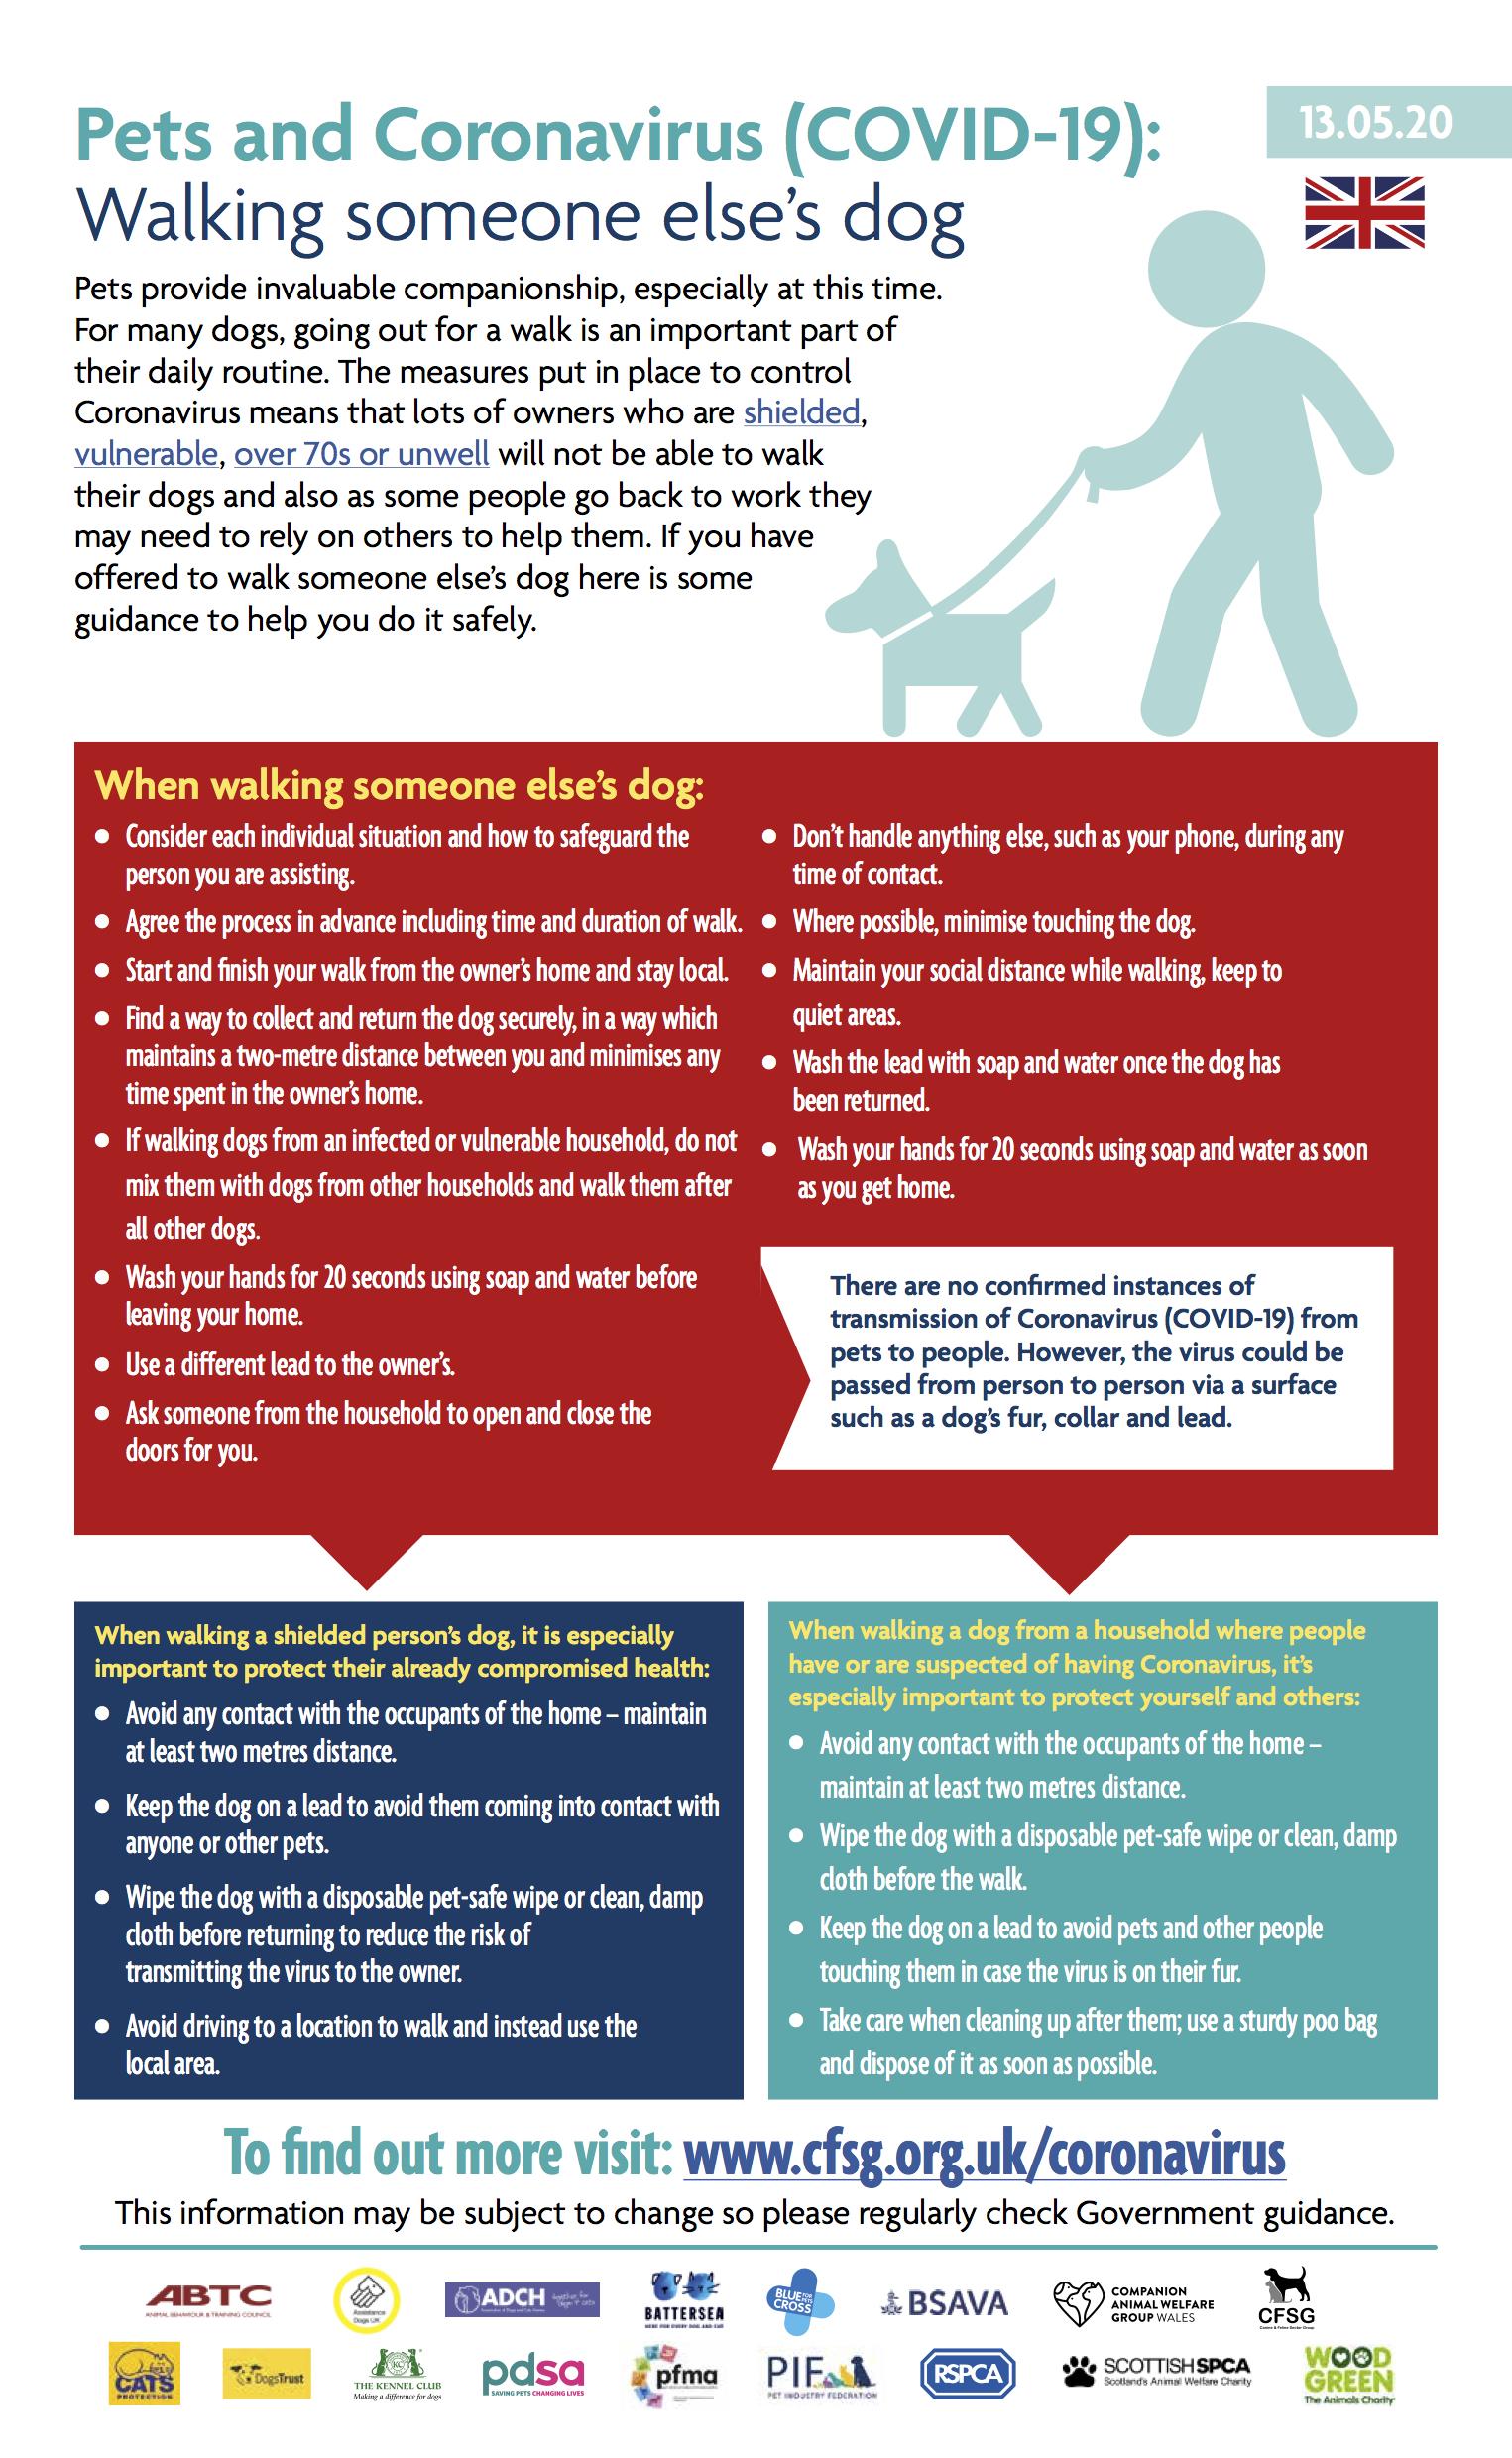 Walking someone else's dog for them during coronavirus